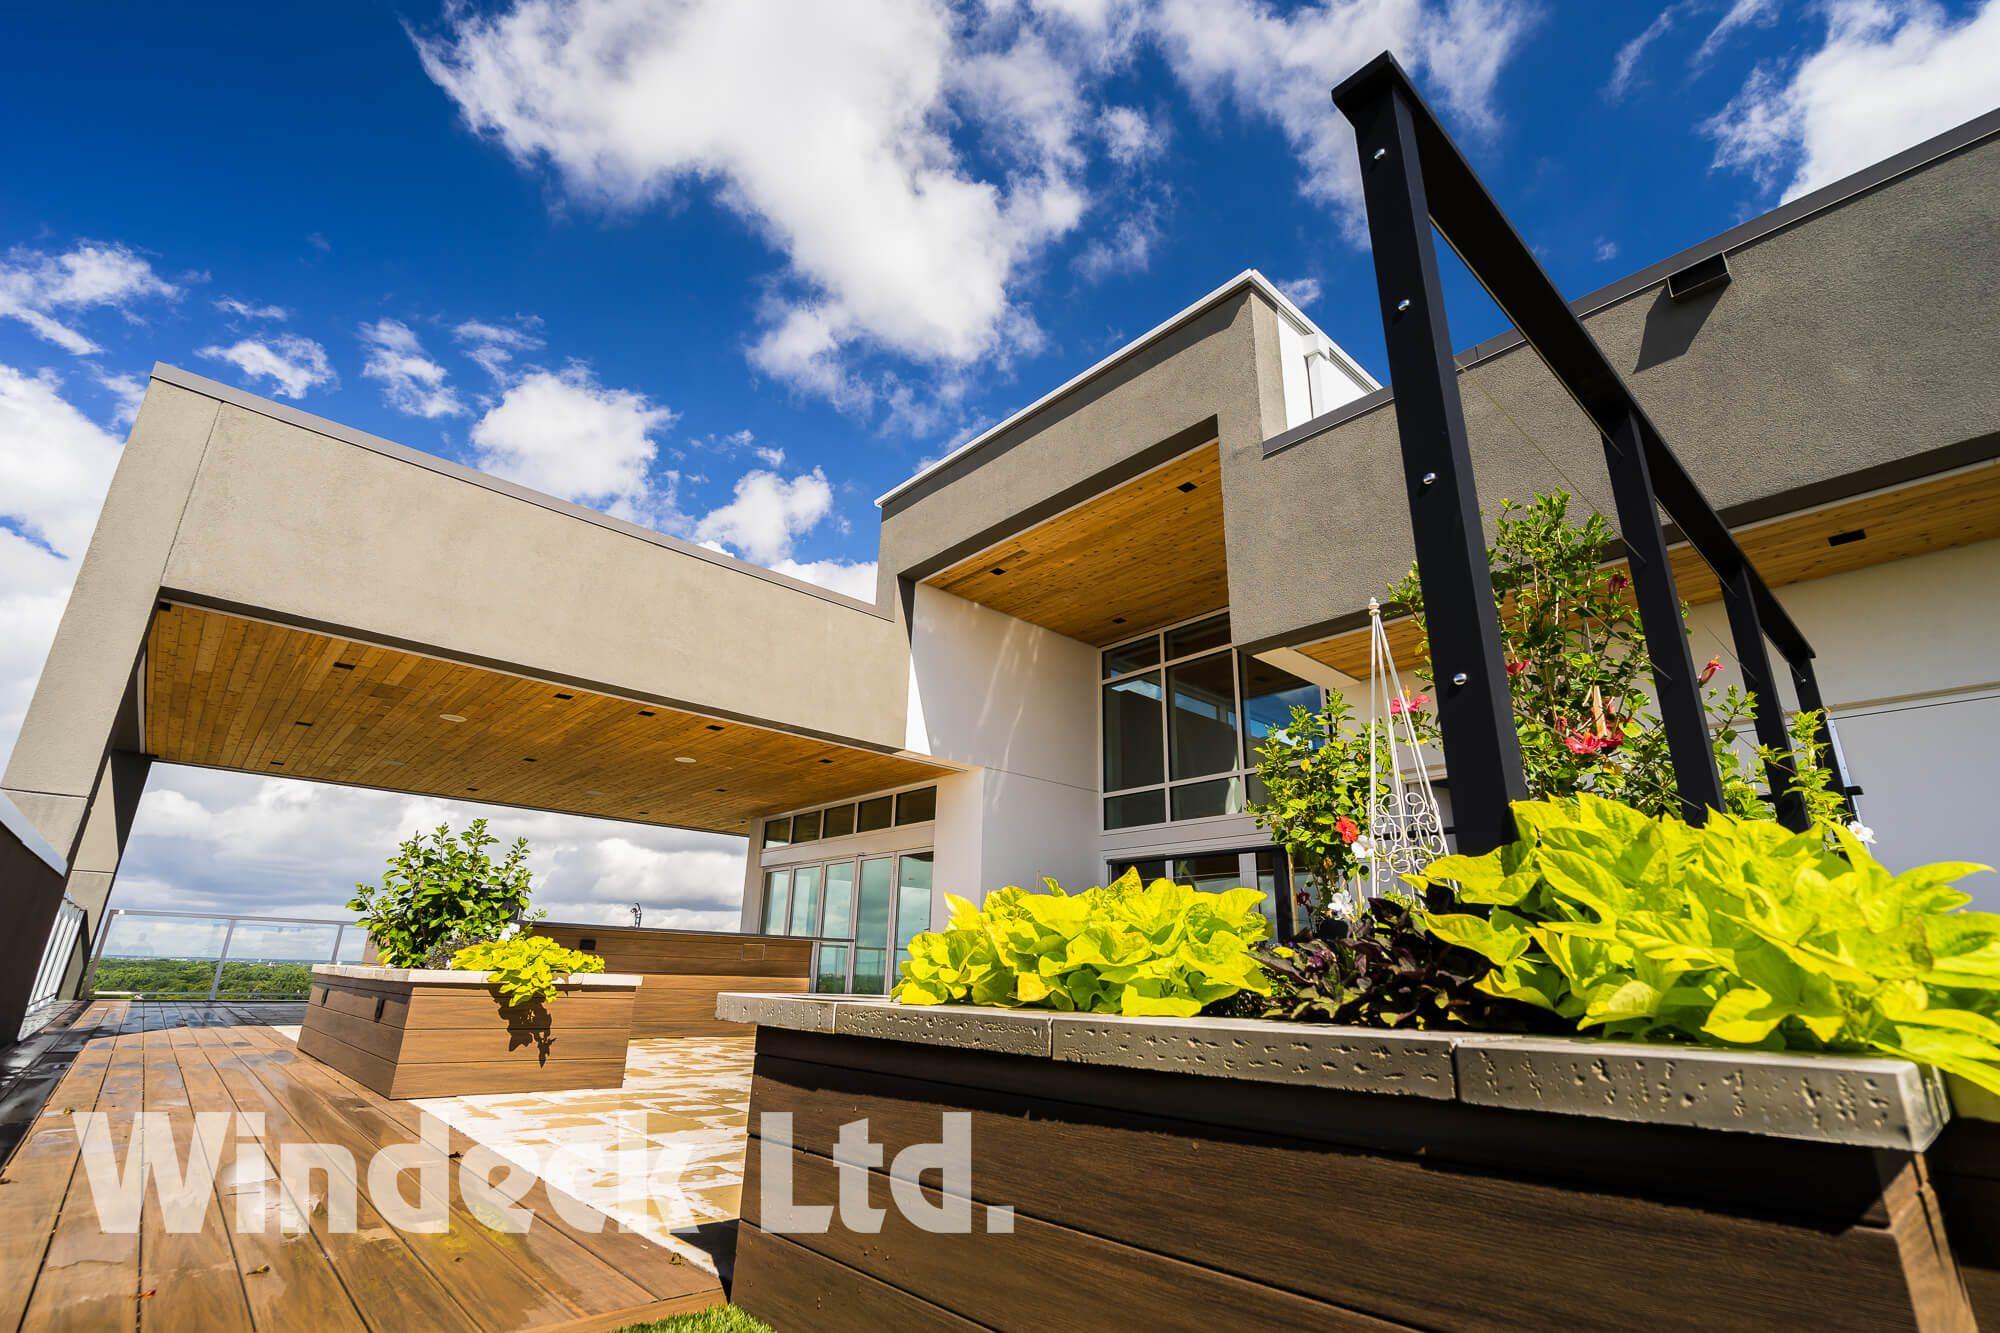 Outdoor Living Spaces - Windeck Ltd. - Deck Builder Winnipeg, Manitoba